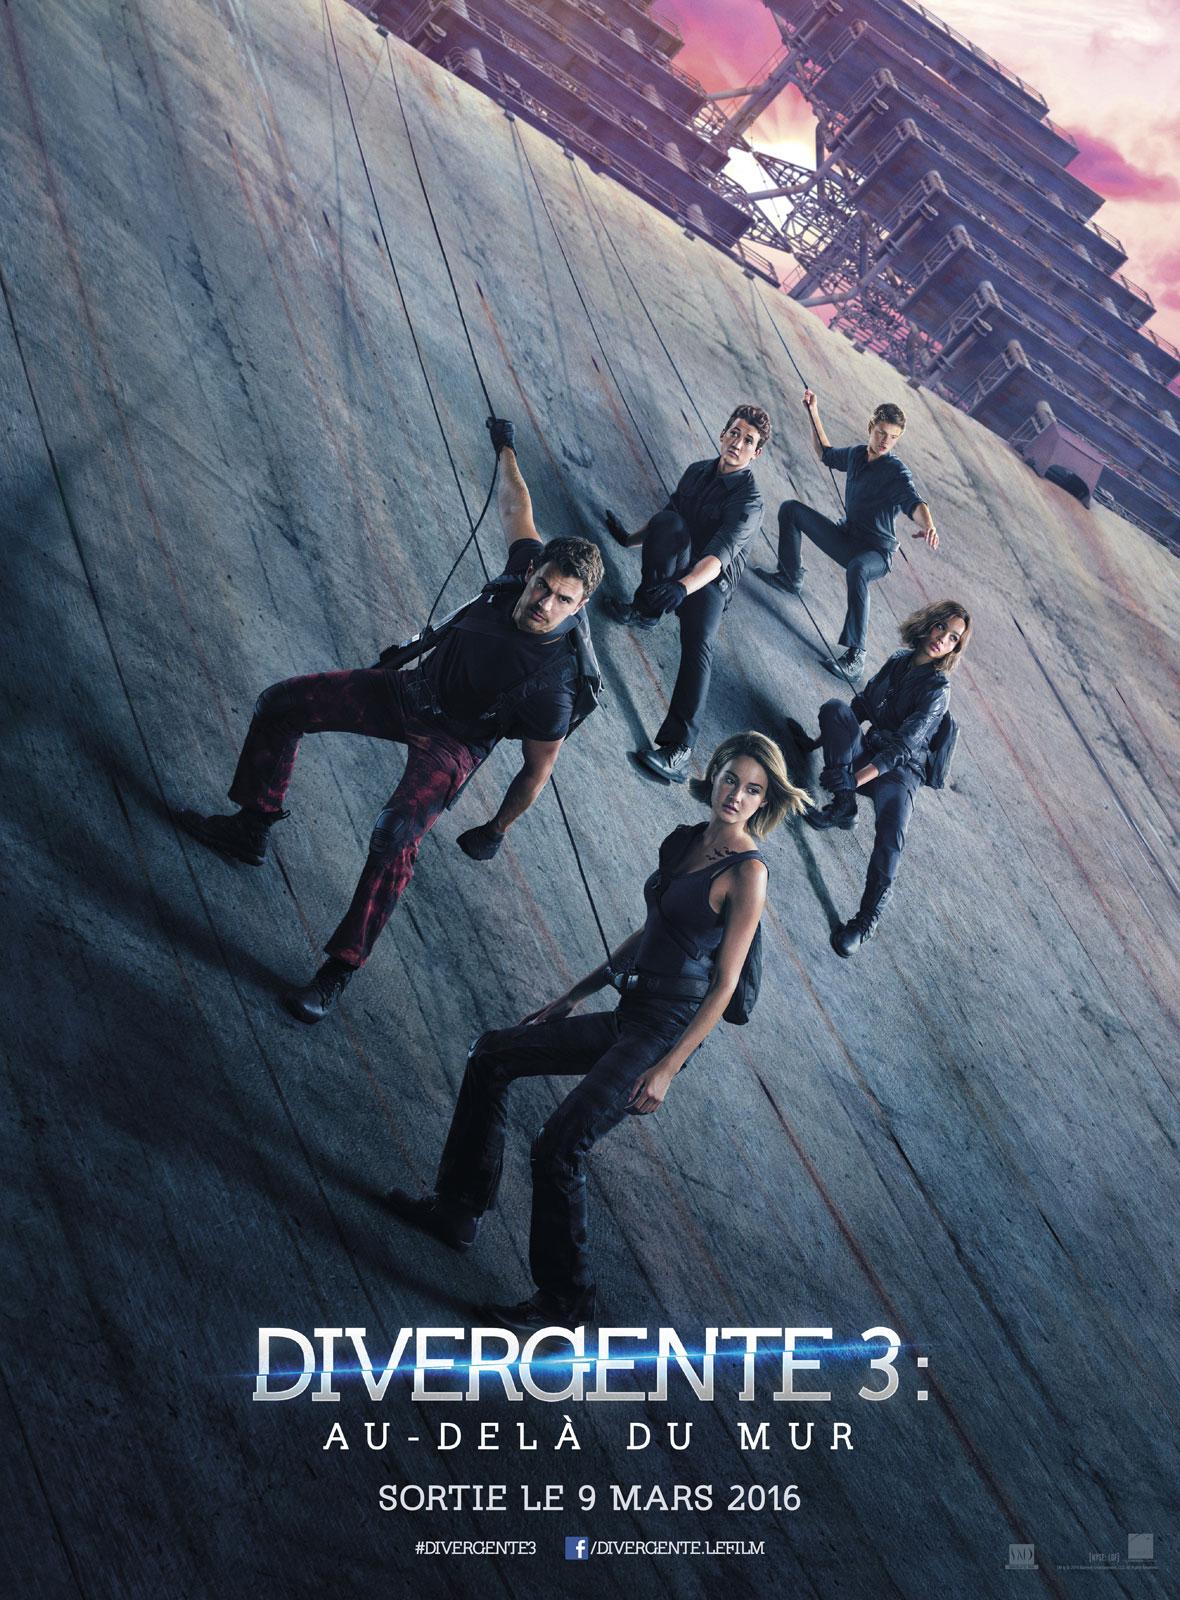 Divergente 3 au-delà du mur